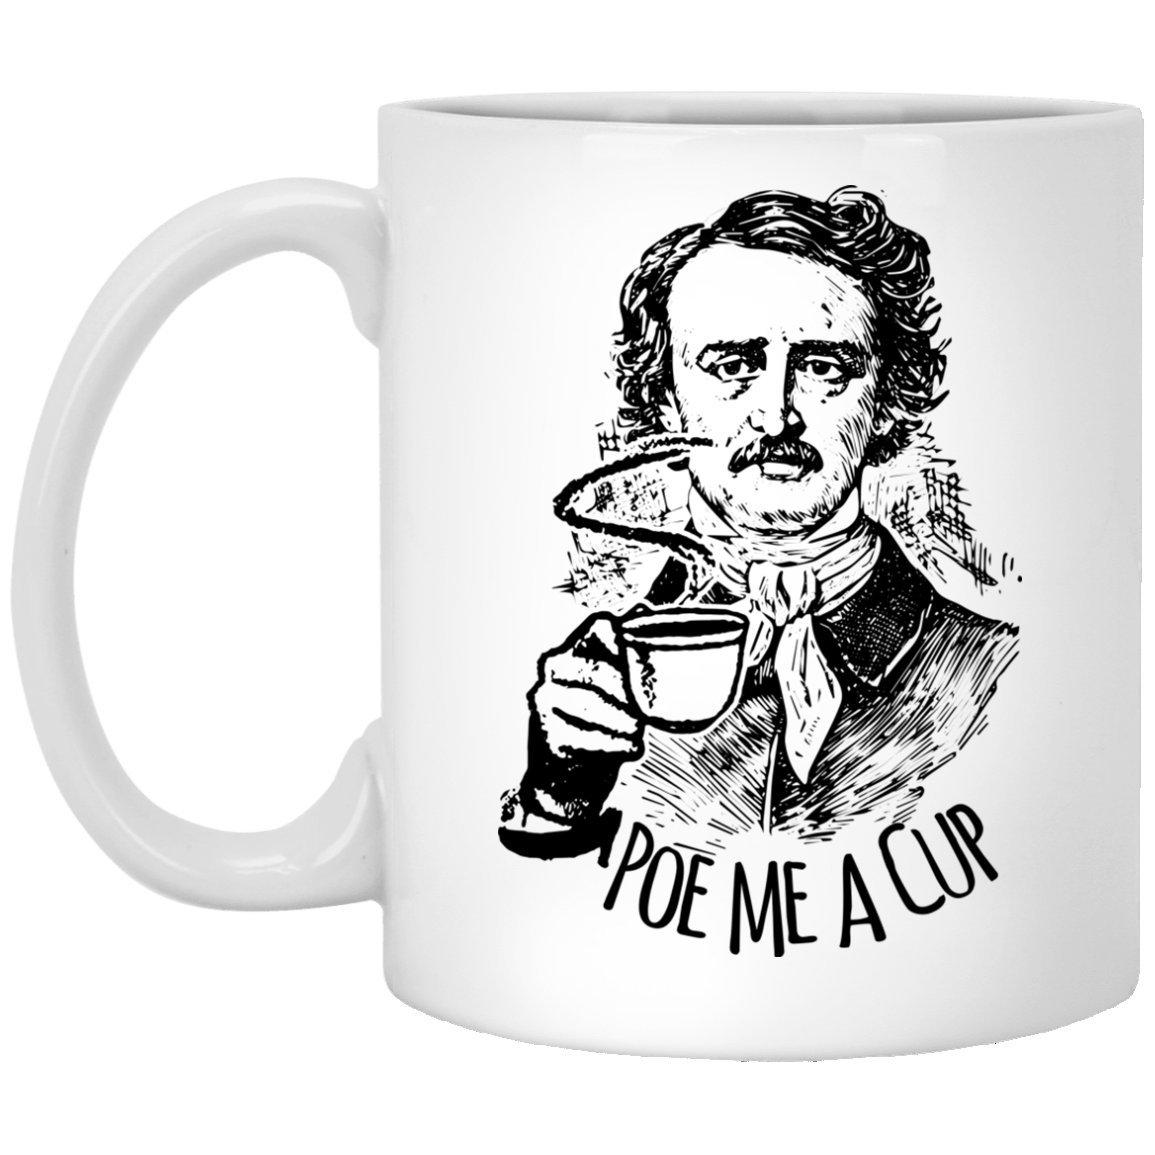 Poe Me A Cup Coffee Mug by TeeCirc Marketplace, Funny Teacher Gift, English Teacher Gift, English Professor Gift, Edgar Allen Poe Mug, Pun Mug, Book Lover Gift